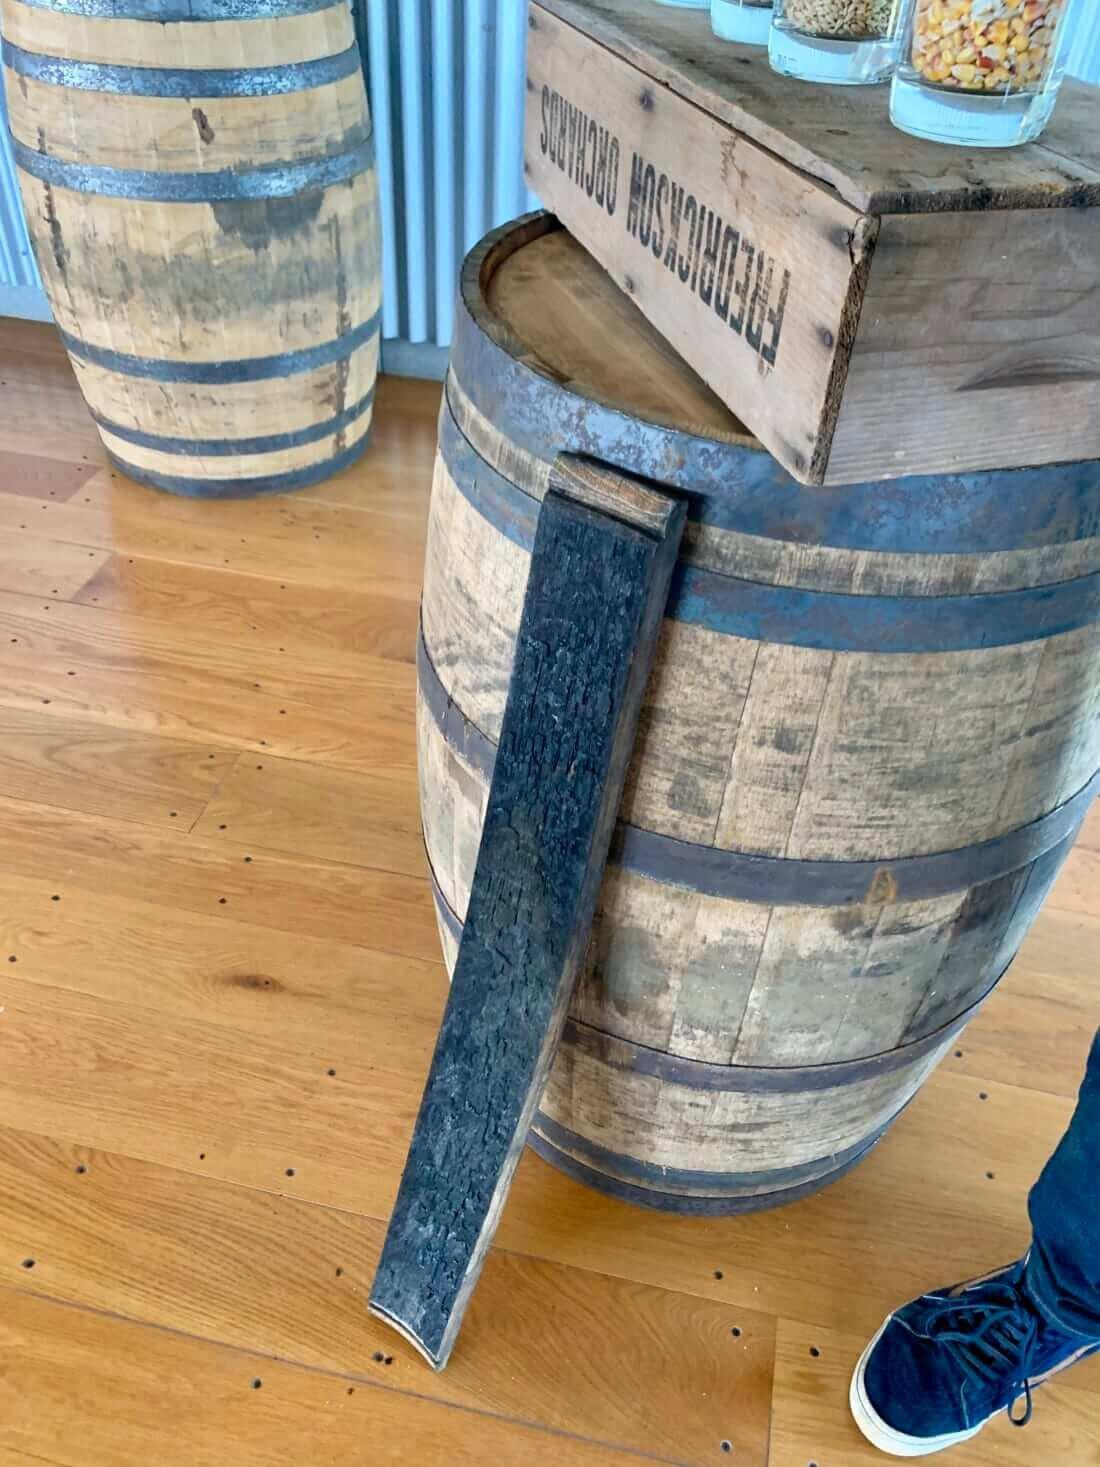 Charred barrel plank at Traverse City Whiskey Co.